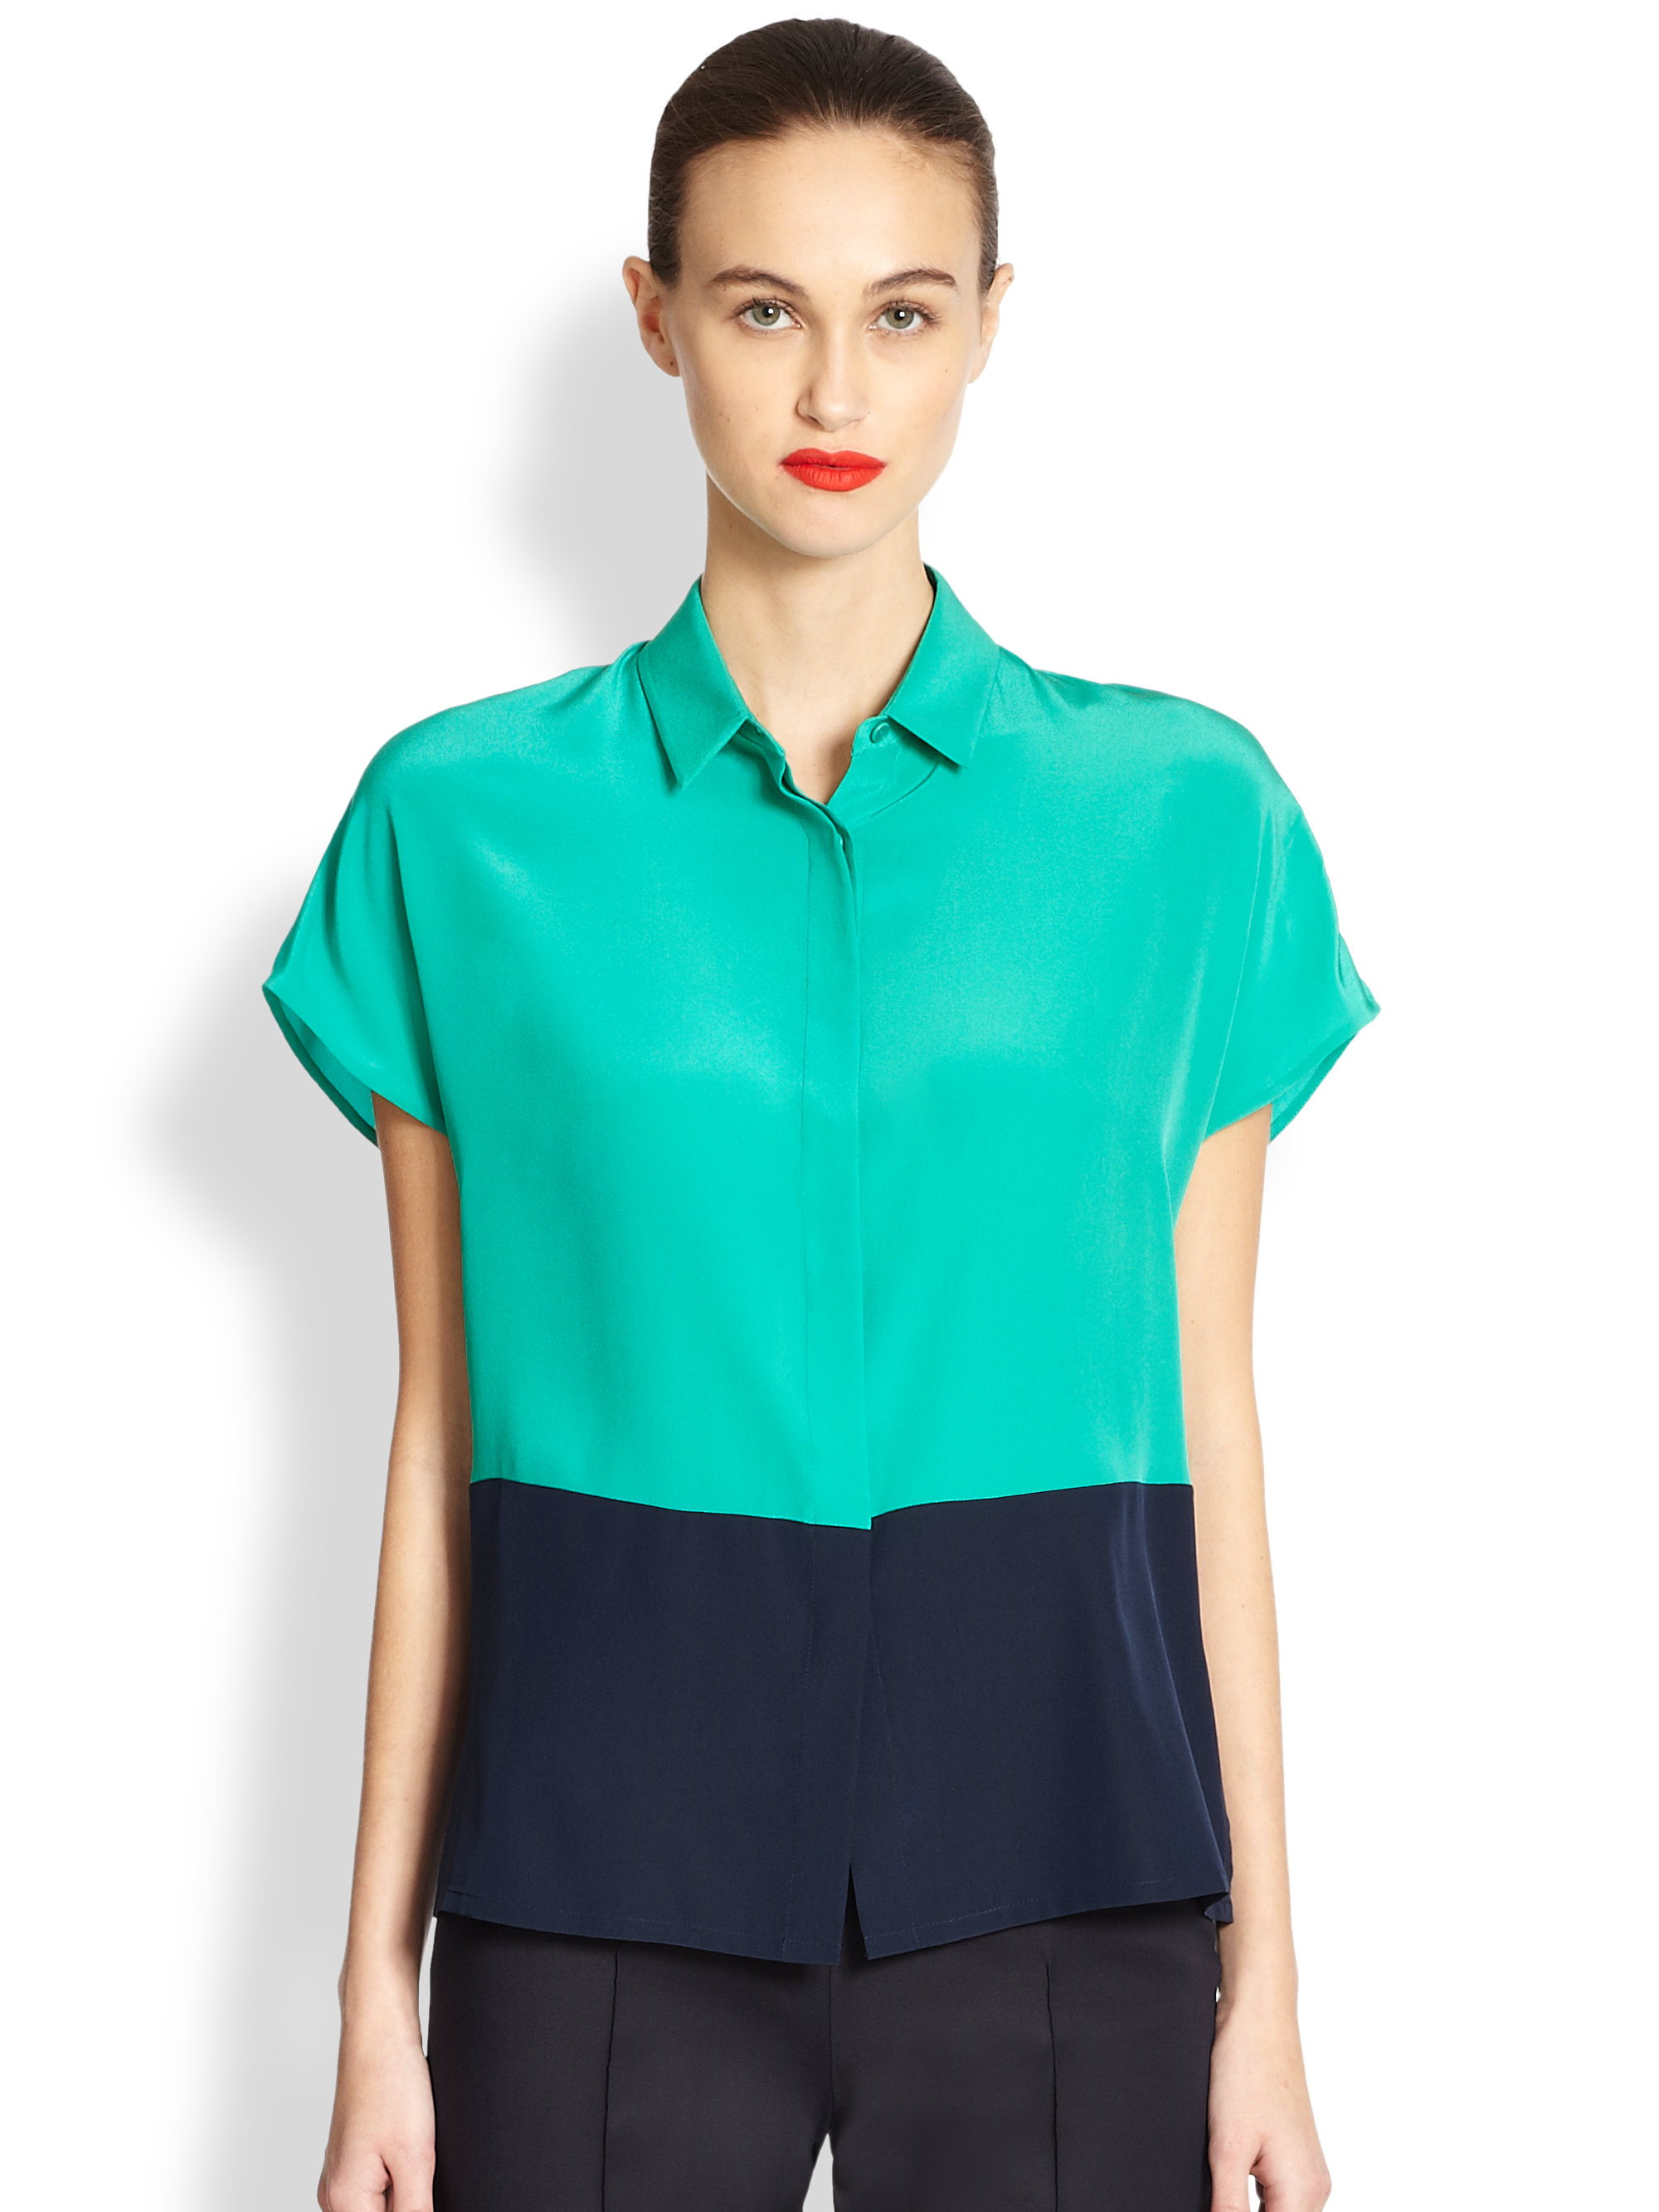 Lyst Akris Punto Two Tone Silk Blouse In Green Akris Punto Blue Two Tone Silk  Blouse